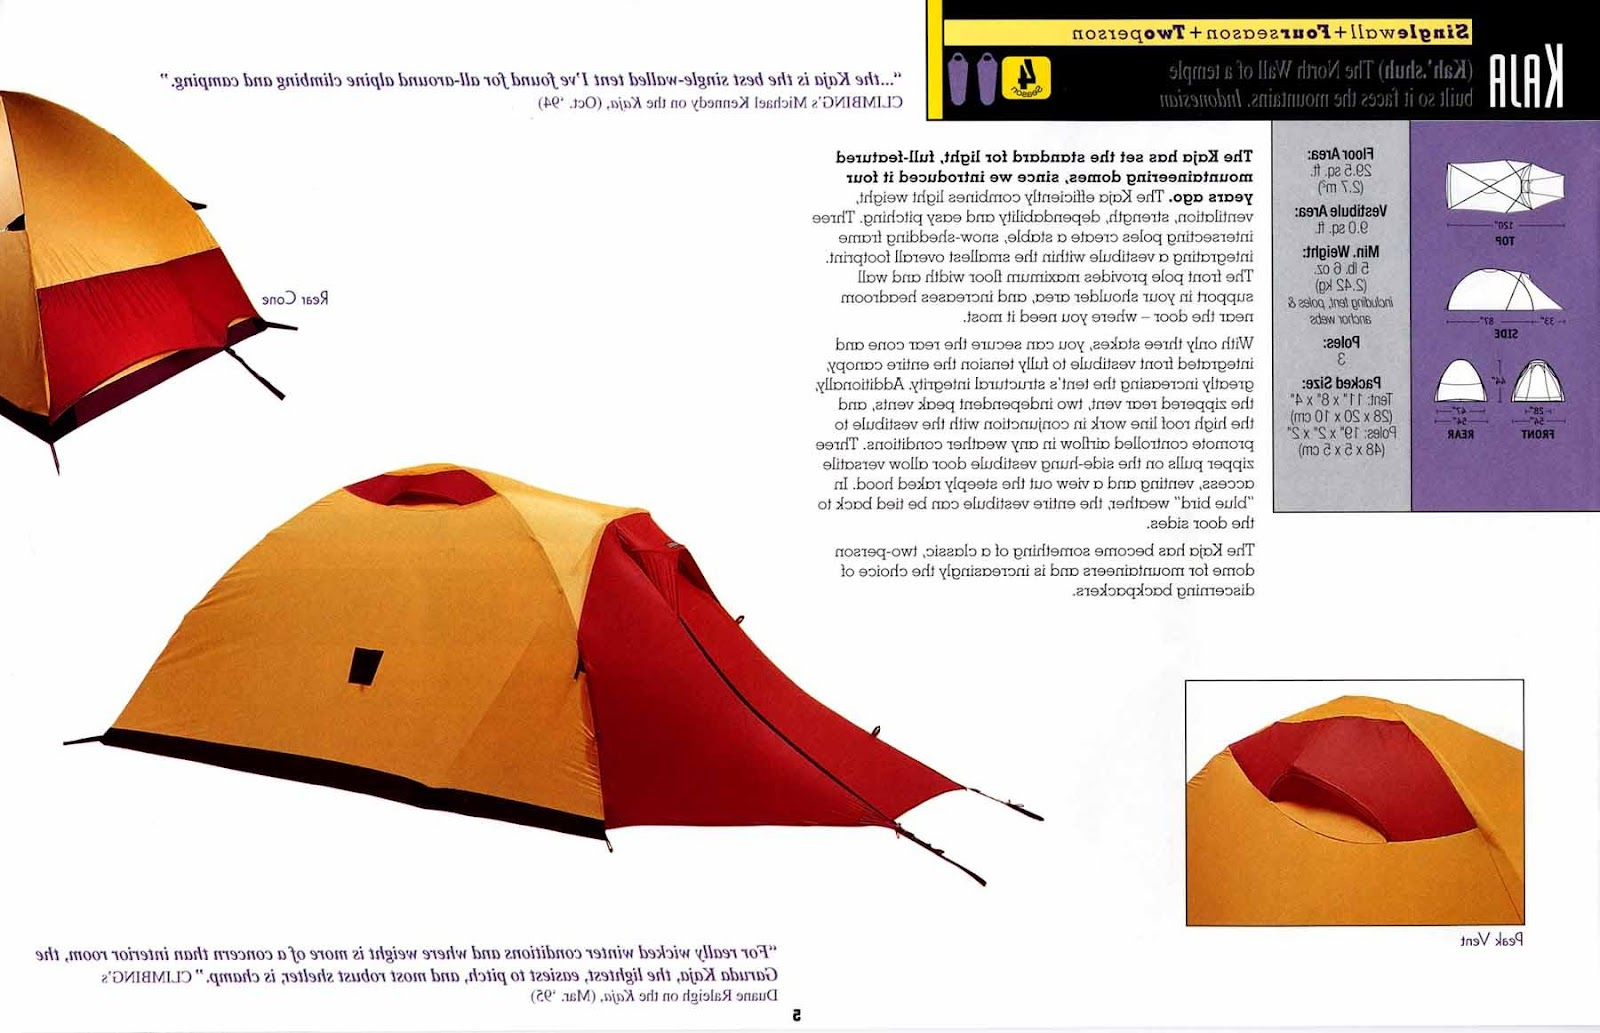 Garuda tent information